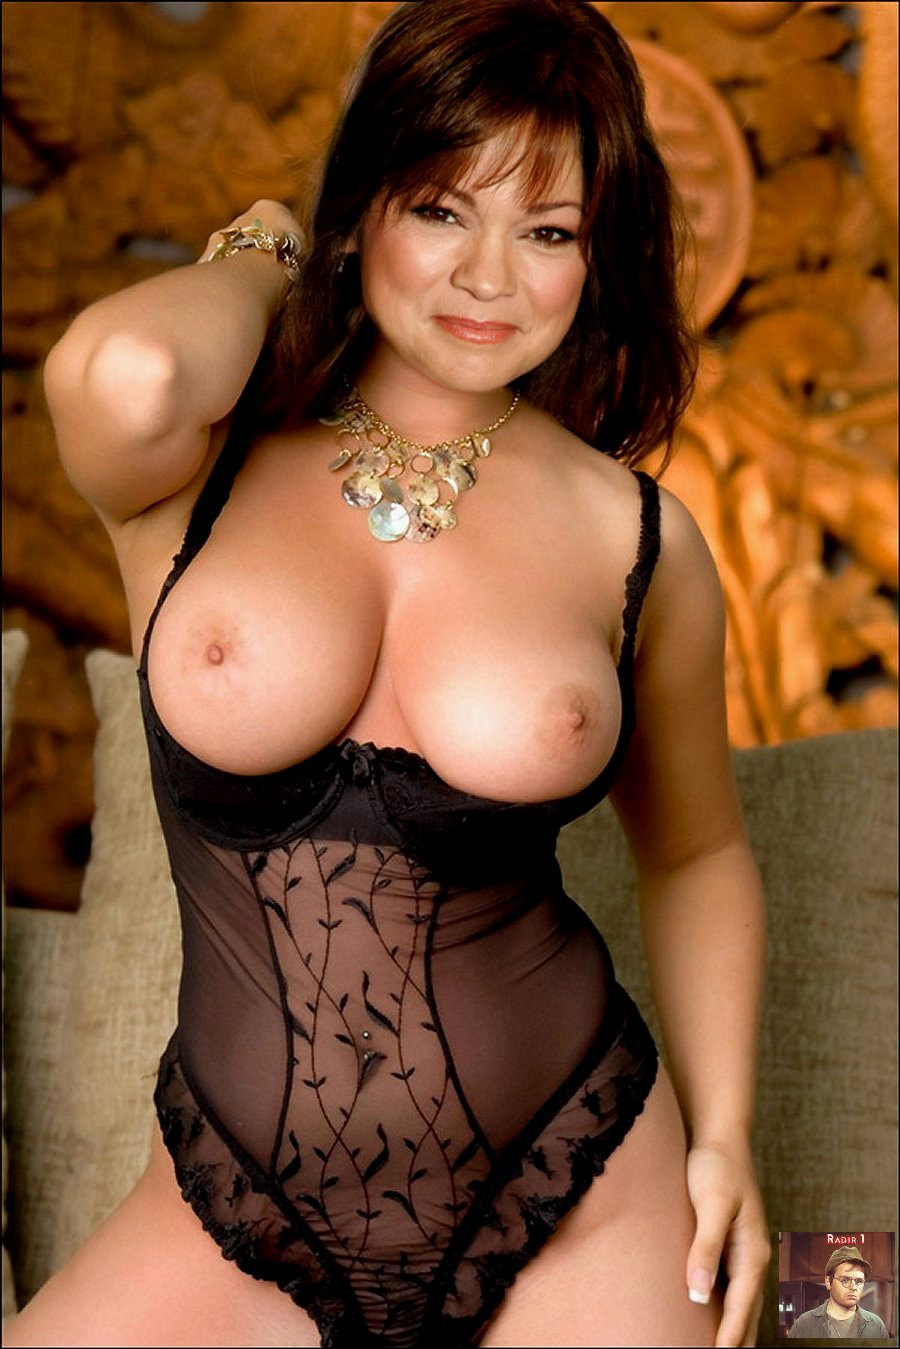 En cerina vincent nude pussy photos